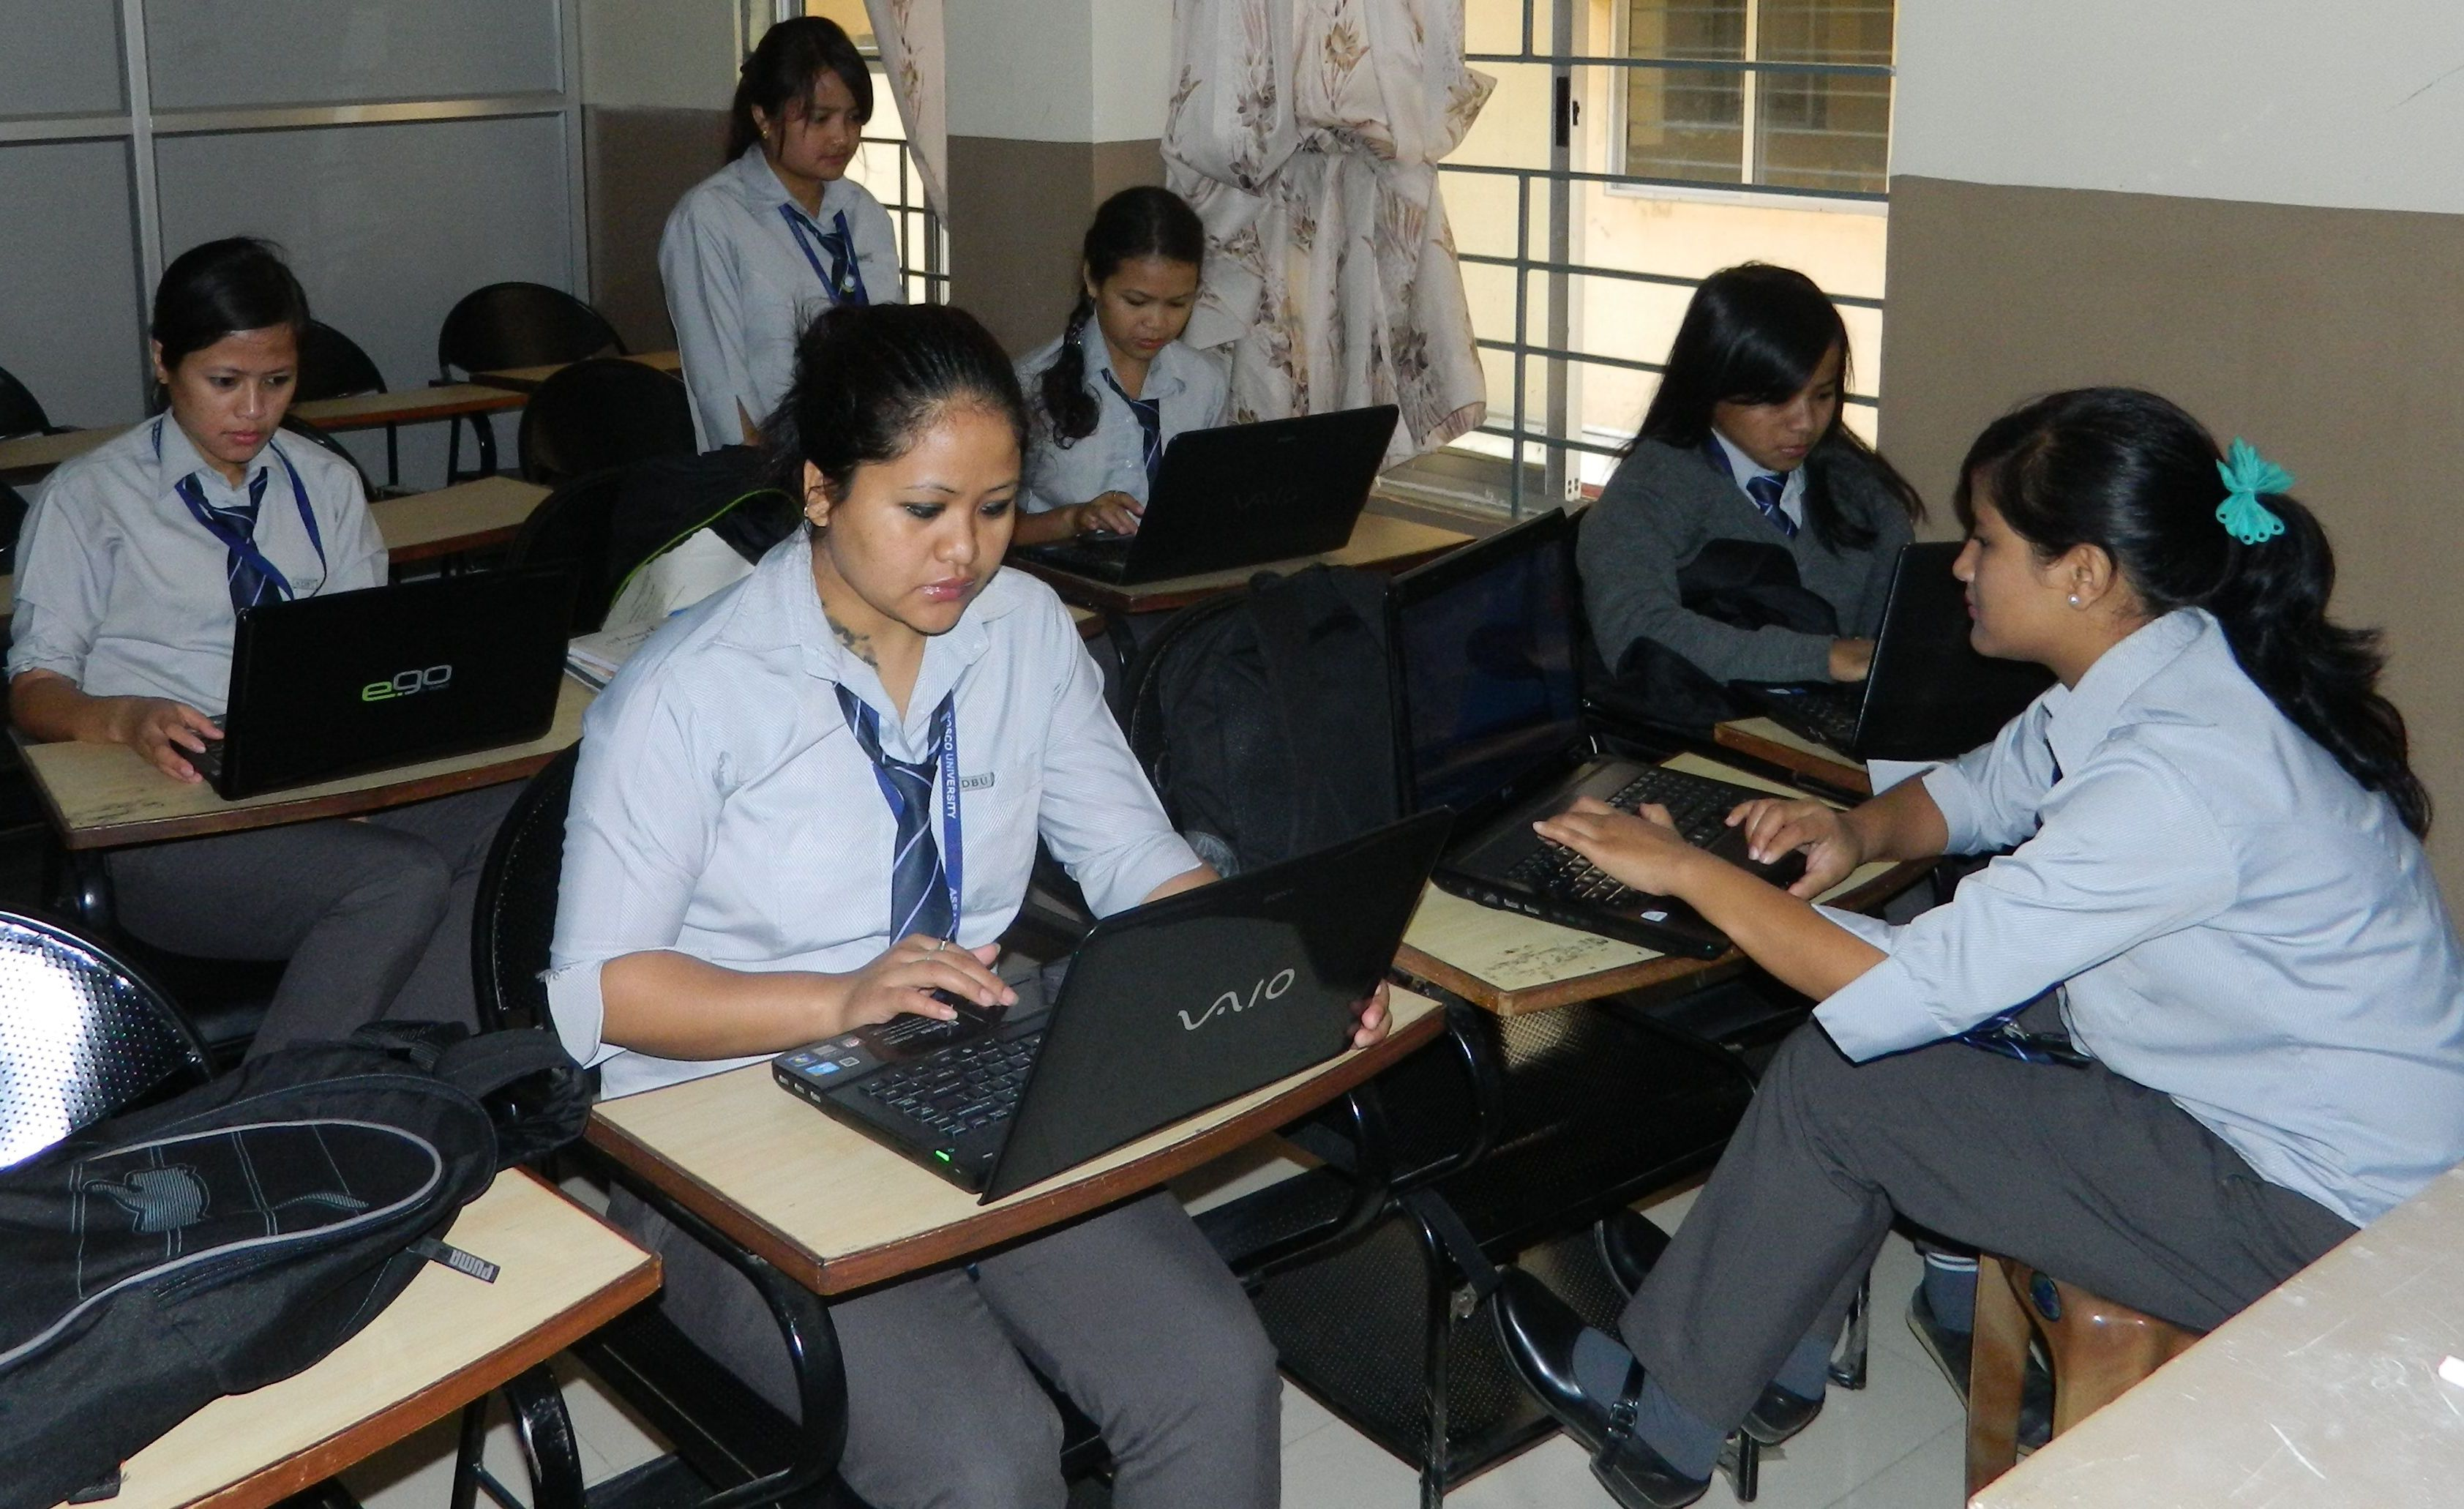 Collège Don Bosco: Assam Don Bosco University